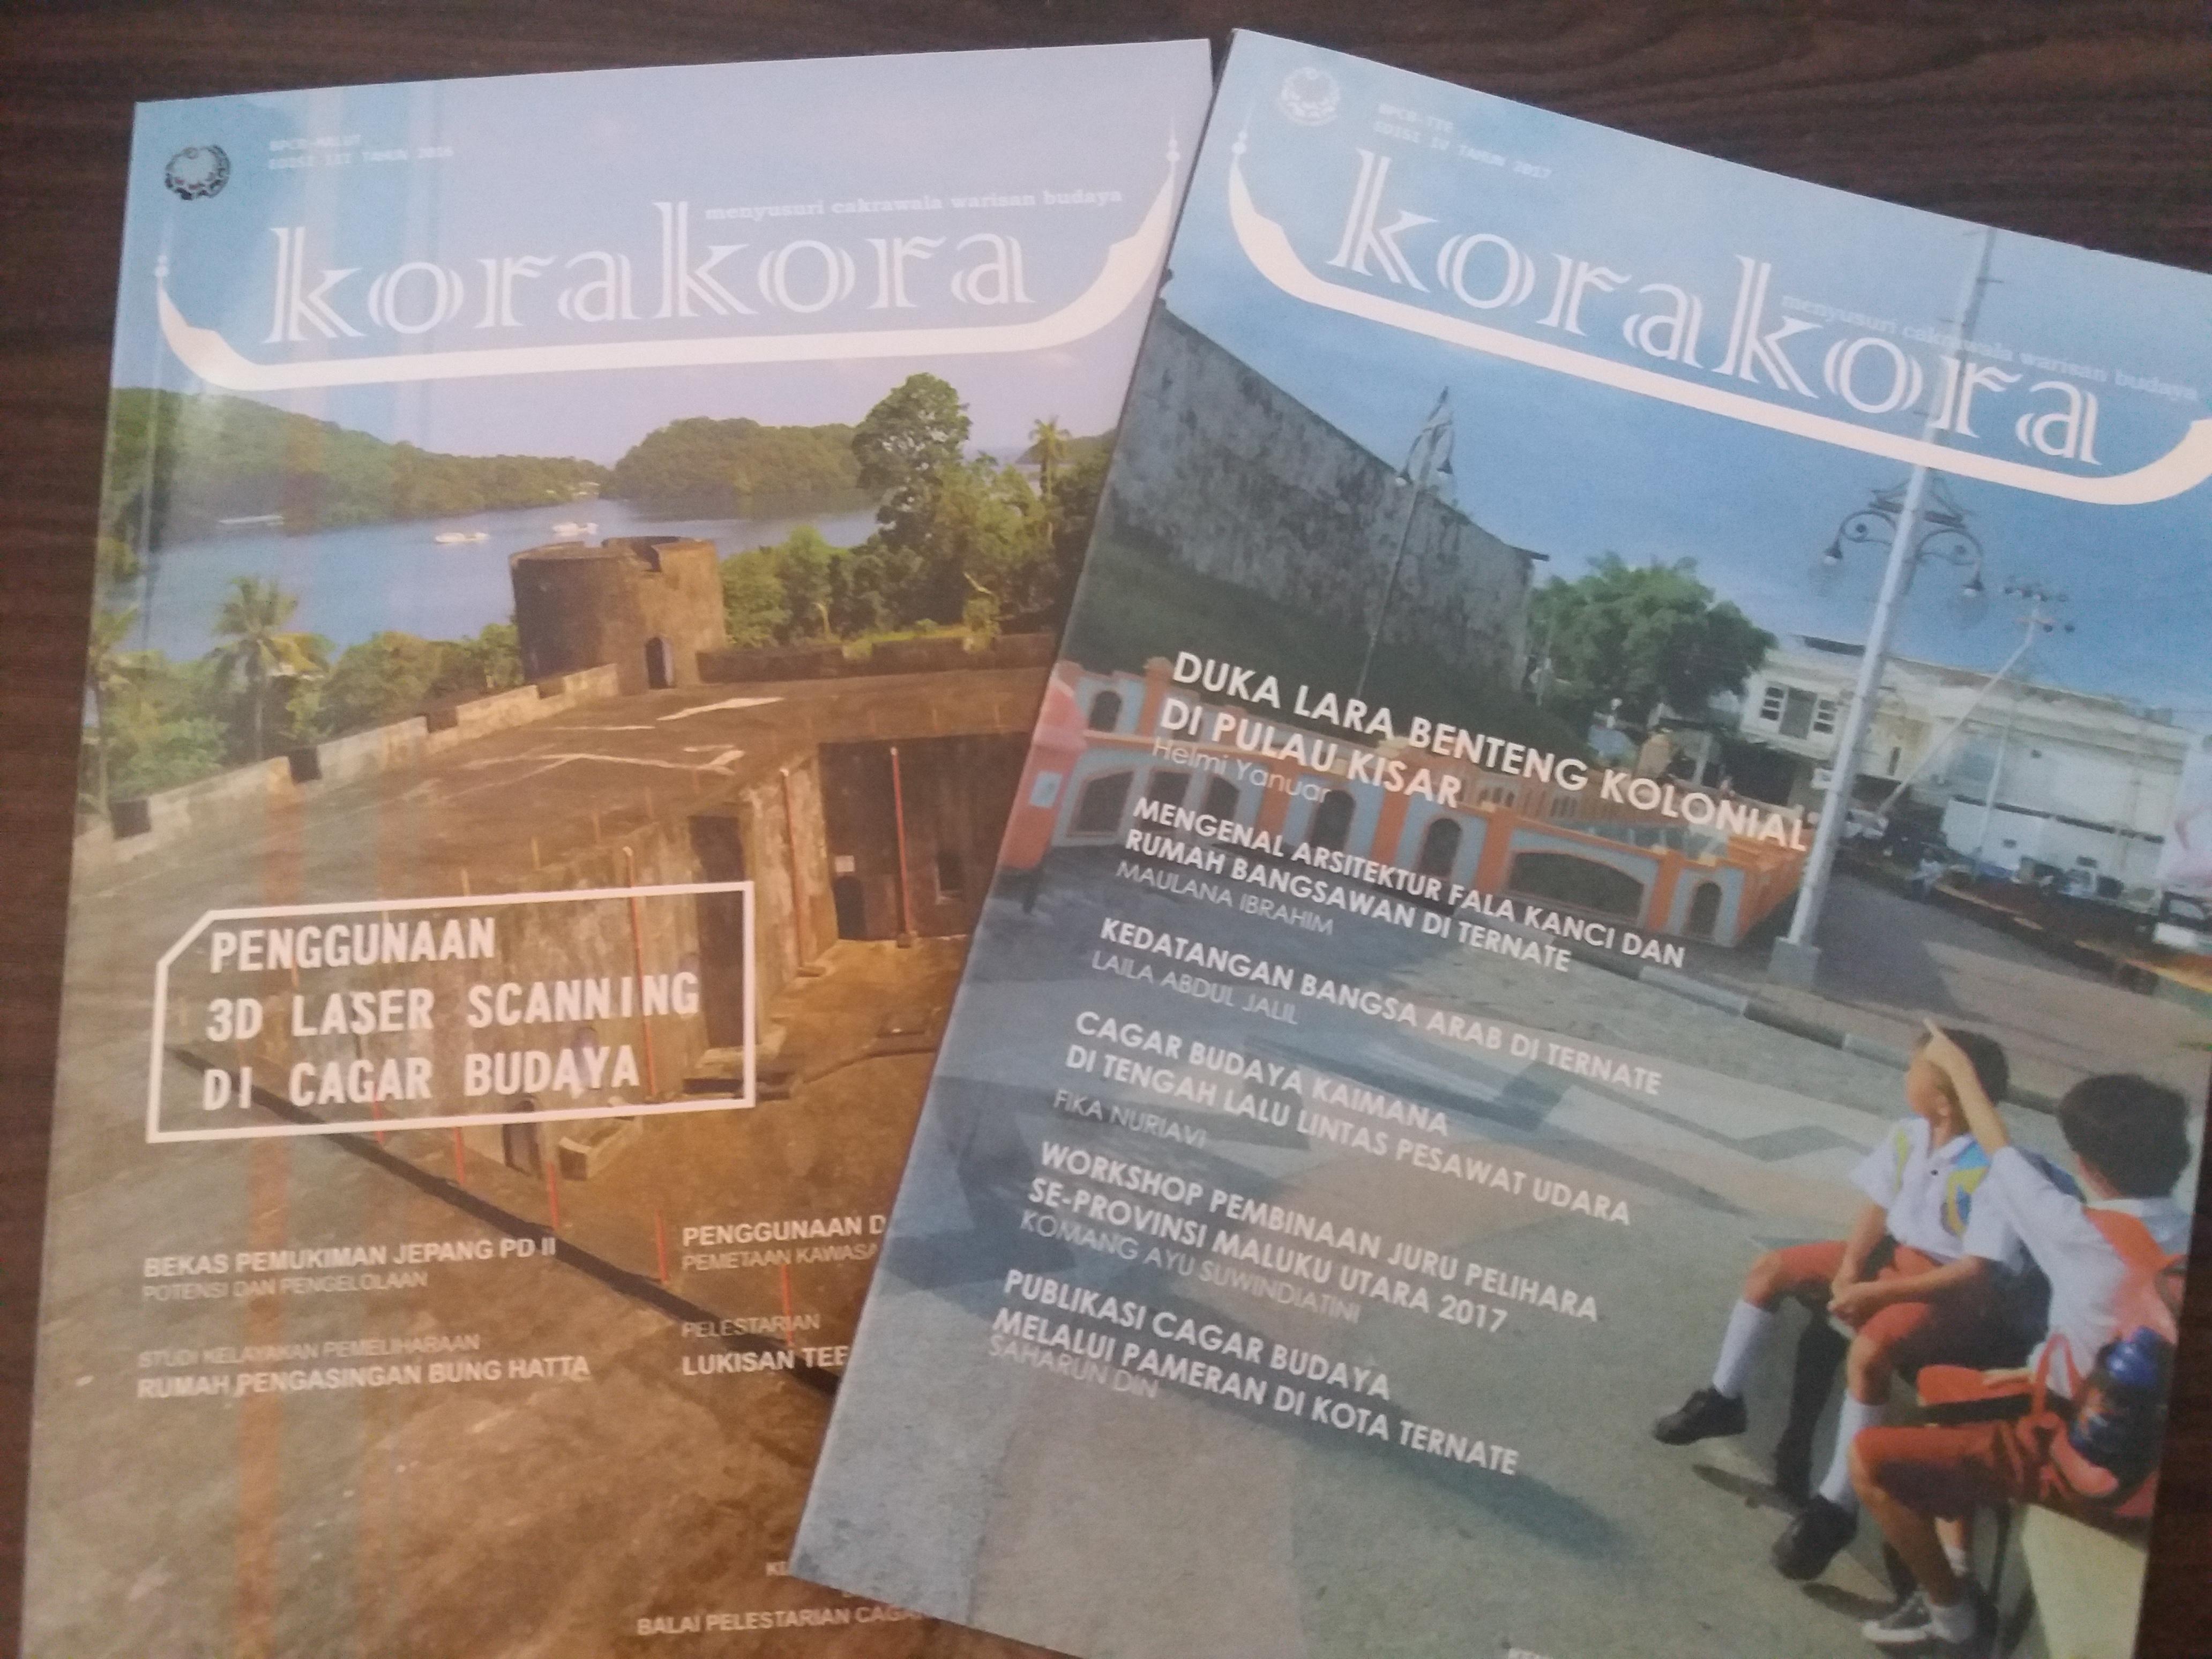 Buletin Kora Kora edisi II tahun 2015